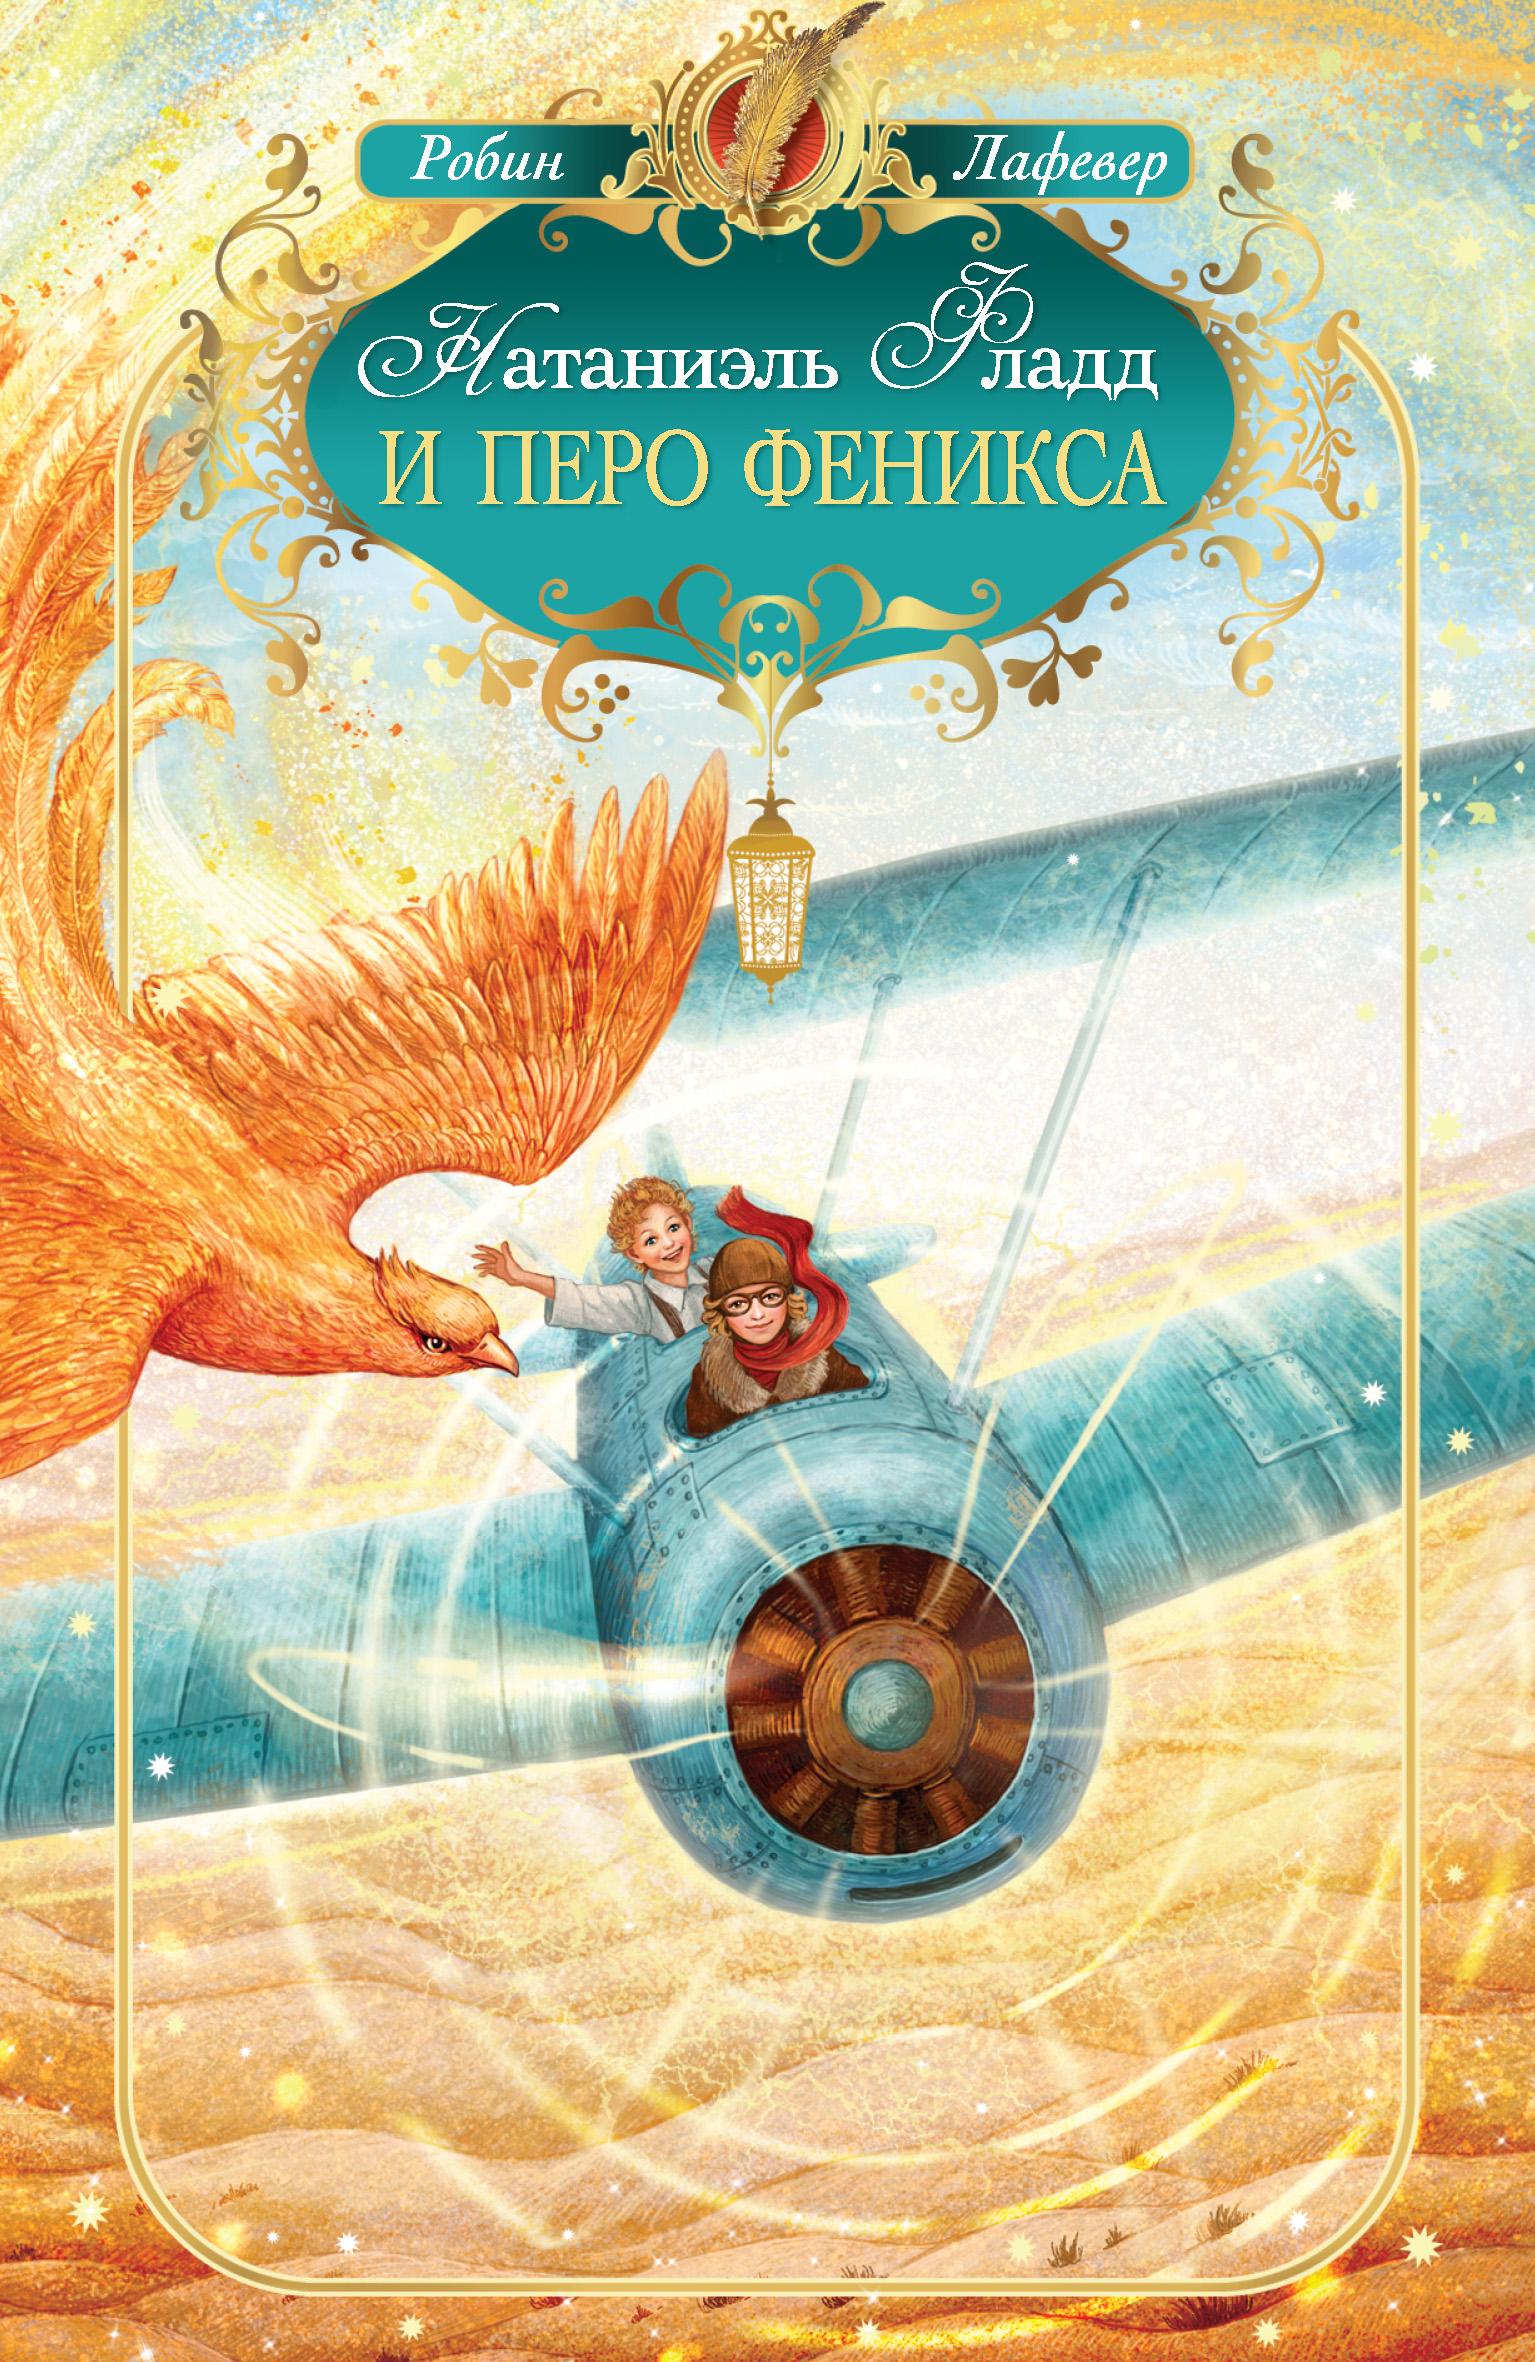 Натаниэль Фладд и перо феникса